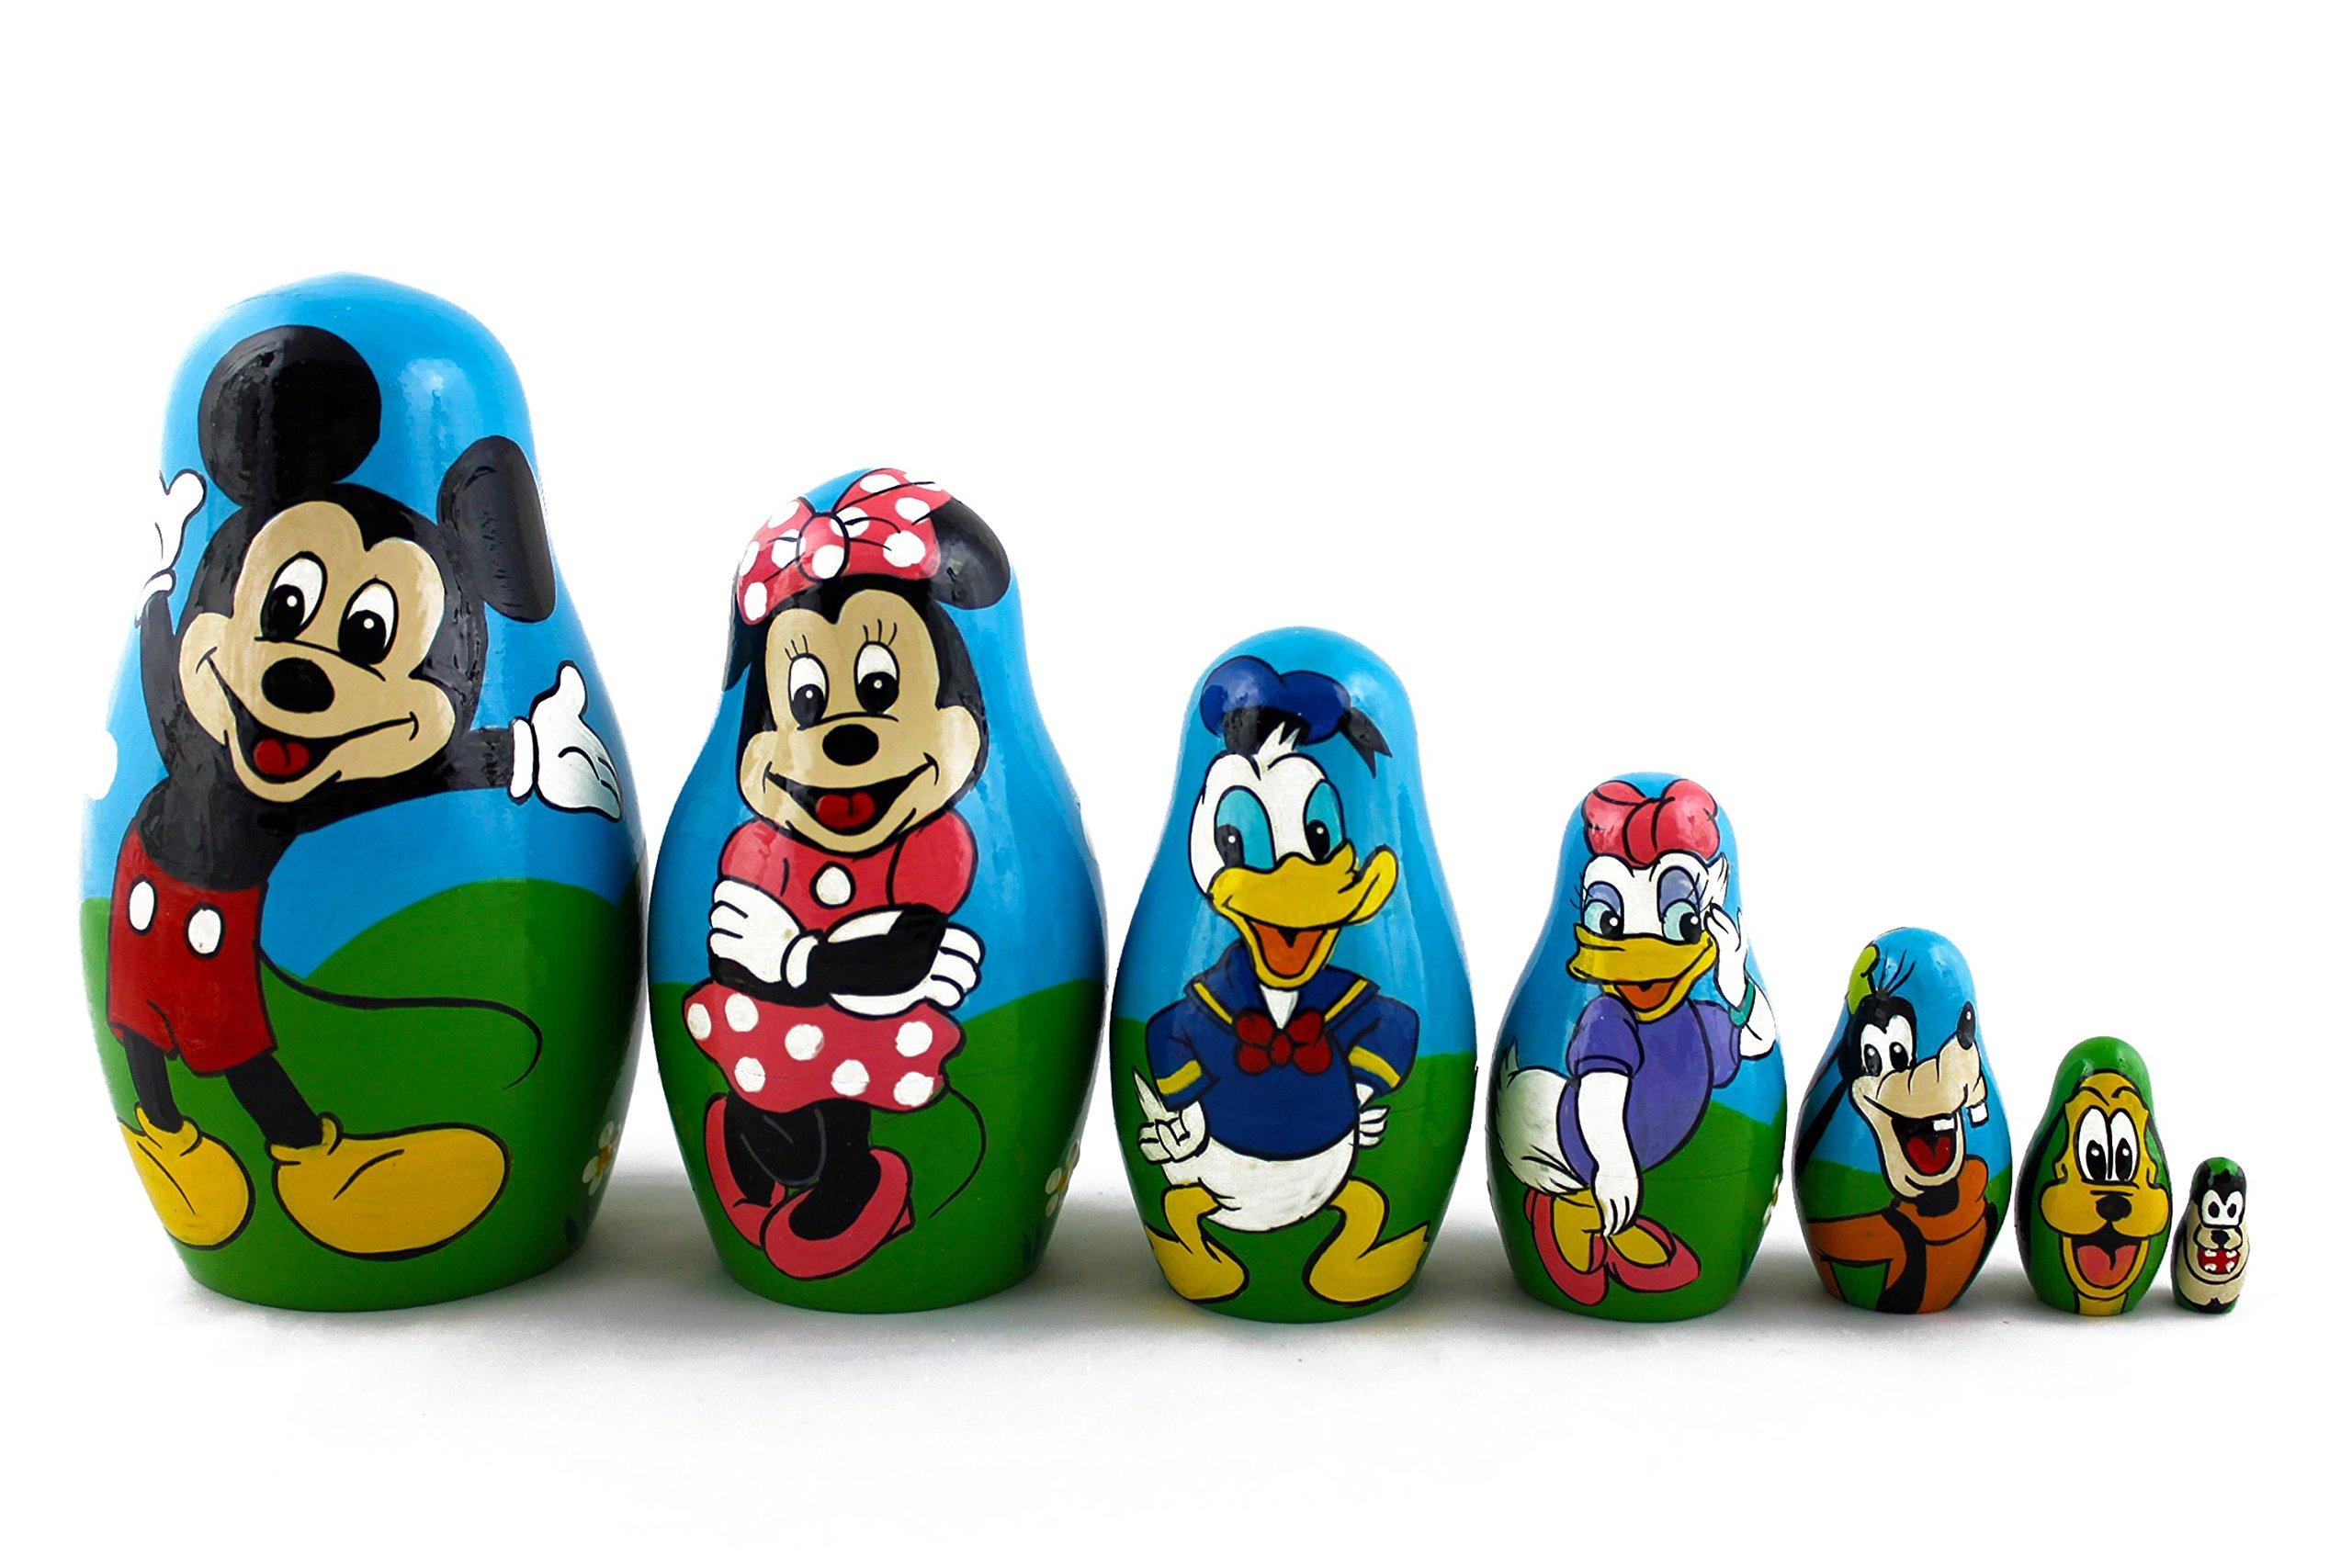 Matryoshka Babushka Russian Nesting Wooden Stacking Doll Best Cartoon Mickey Mouse 7 Pcs by MATRYOSHKA&HANDICRAFT